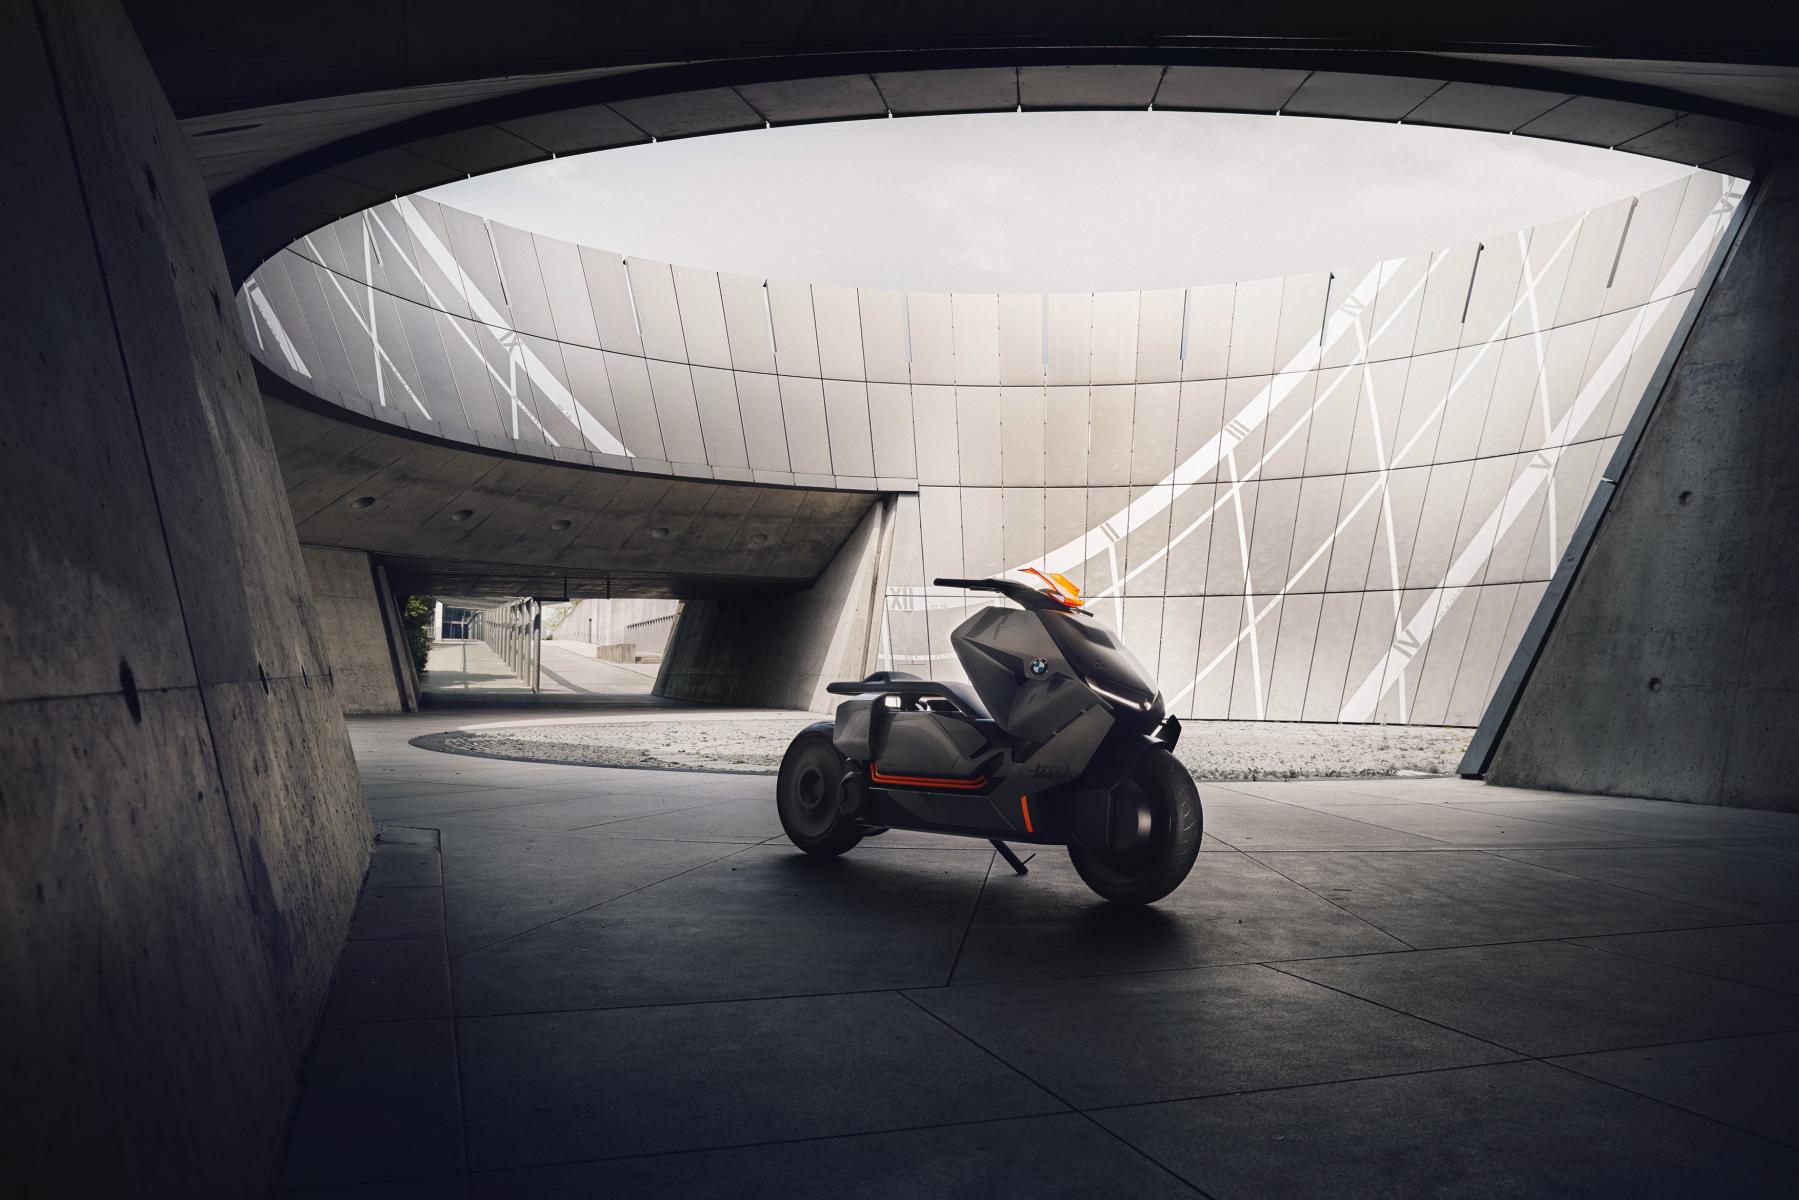 BMW、KTM 等歐洲廠牌也已在進行電動車的開發測試,國外已有實際車款上市